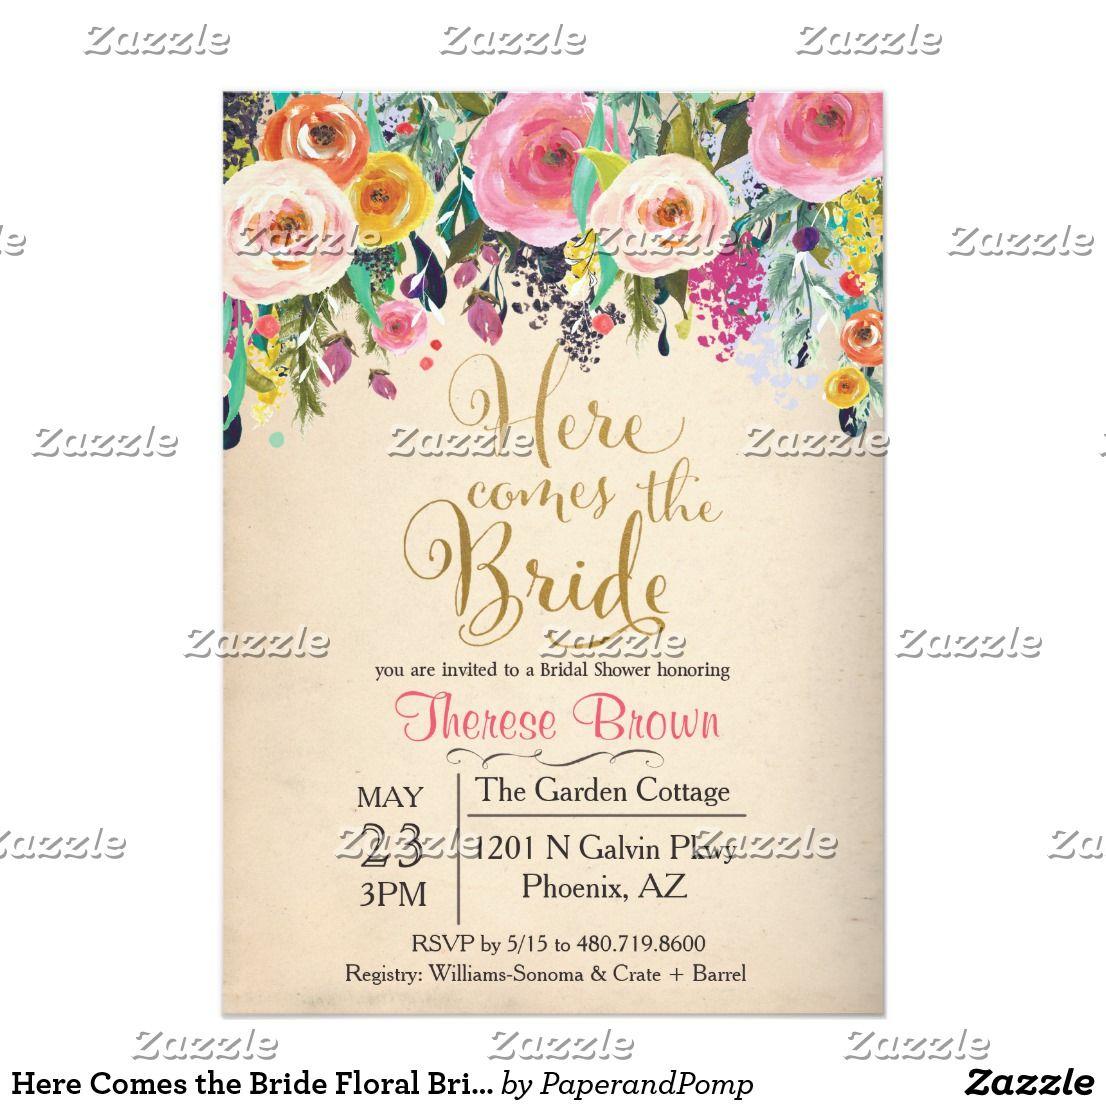 Here Comes The Bride Floral Bridal Invitation Wedding